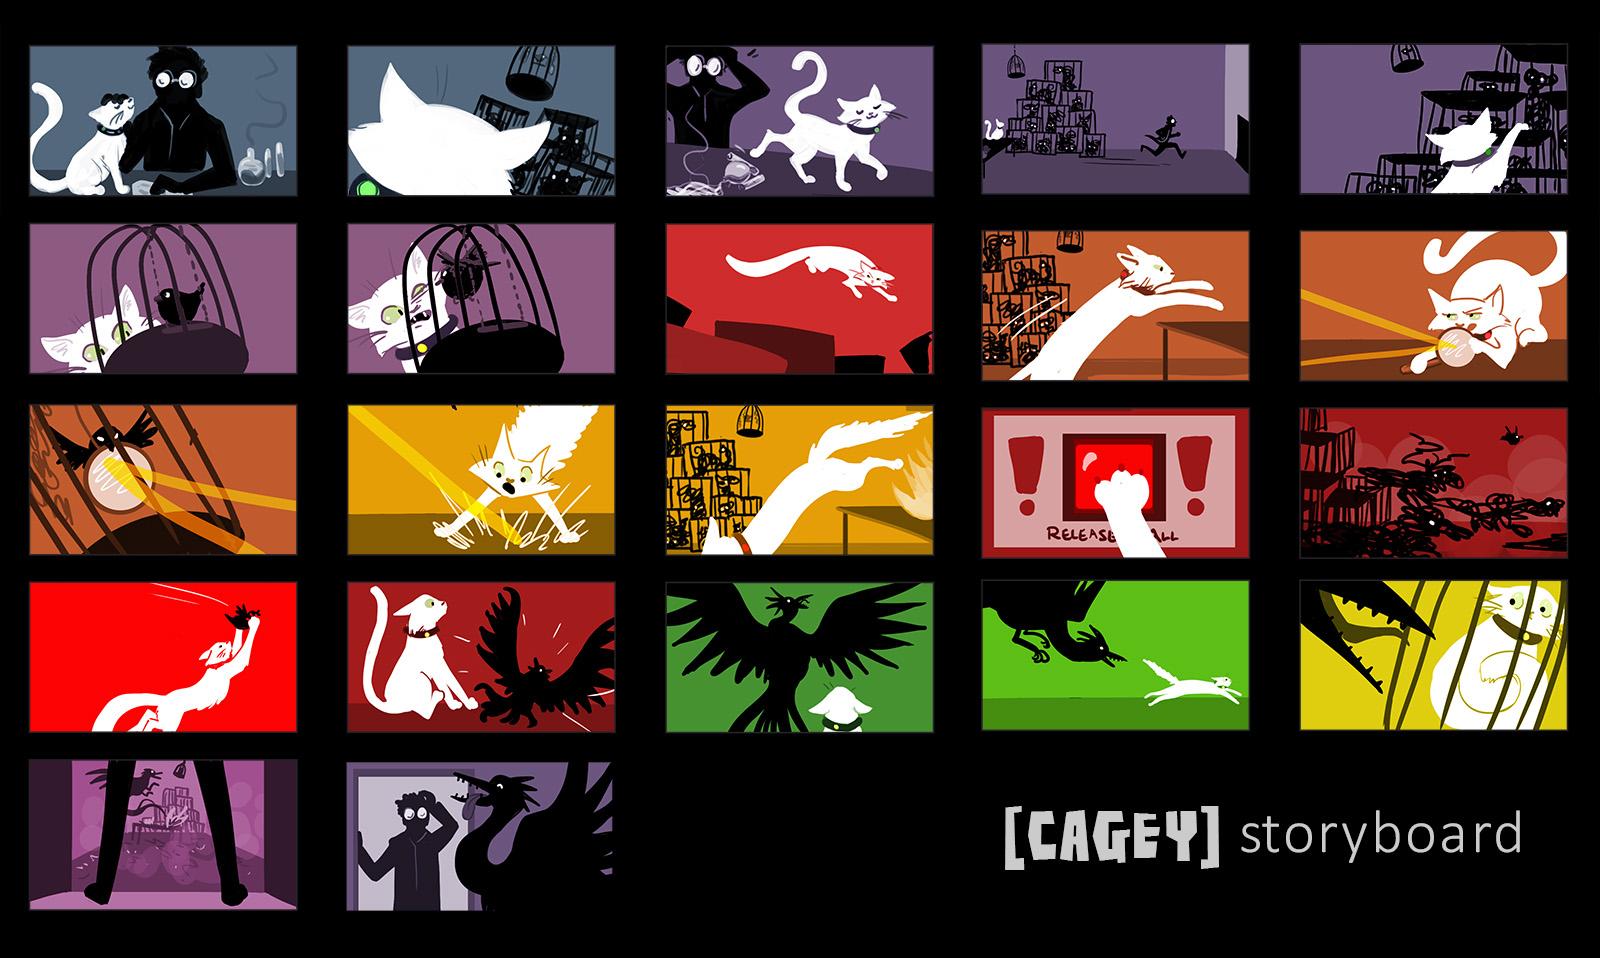 cagey storyboard web.jpg